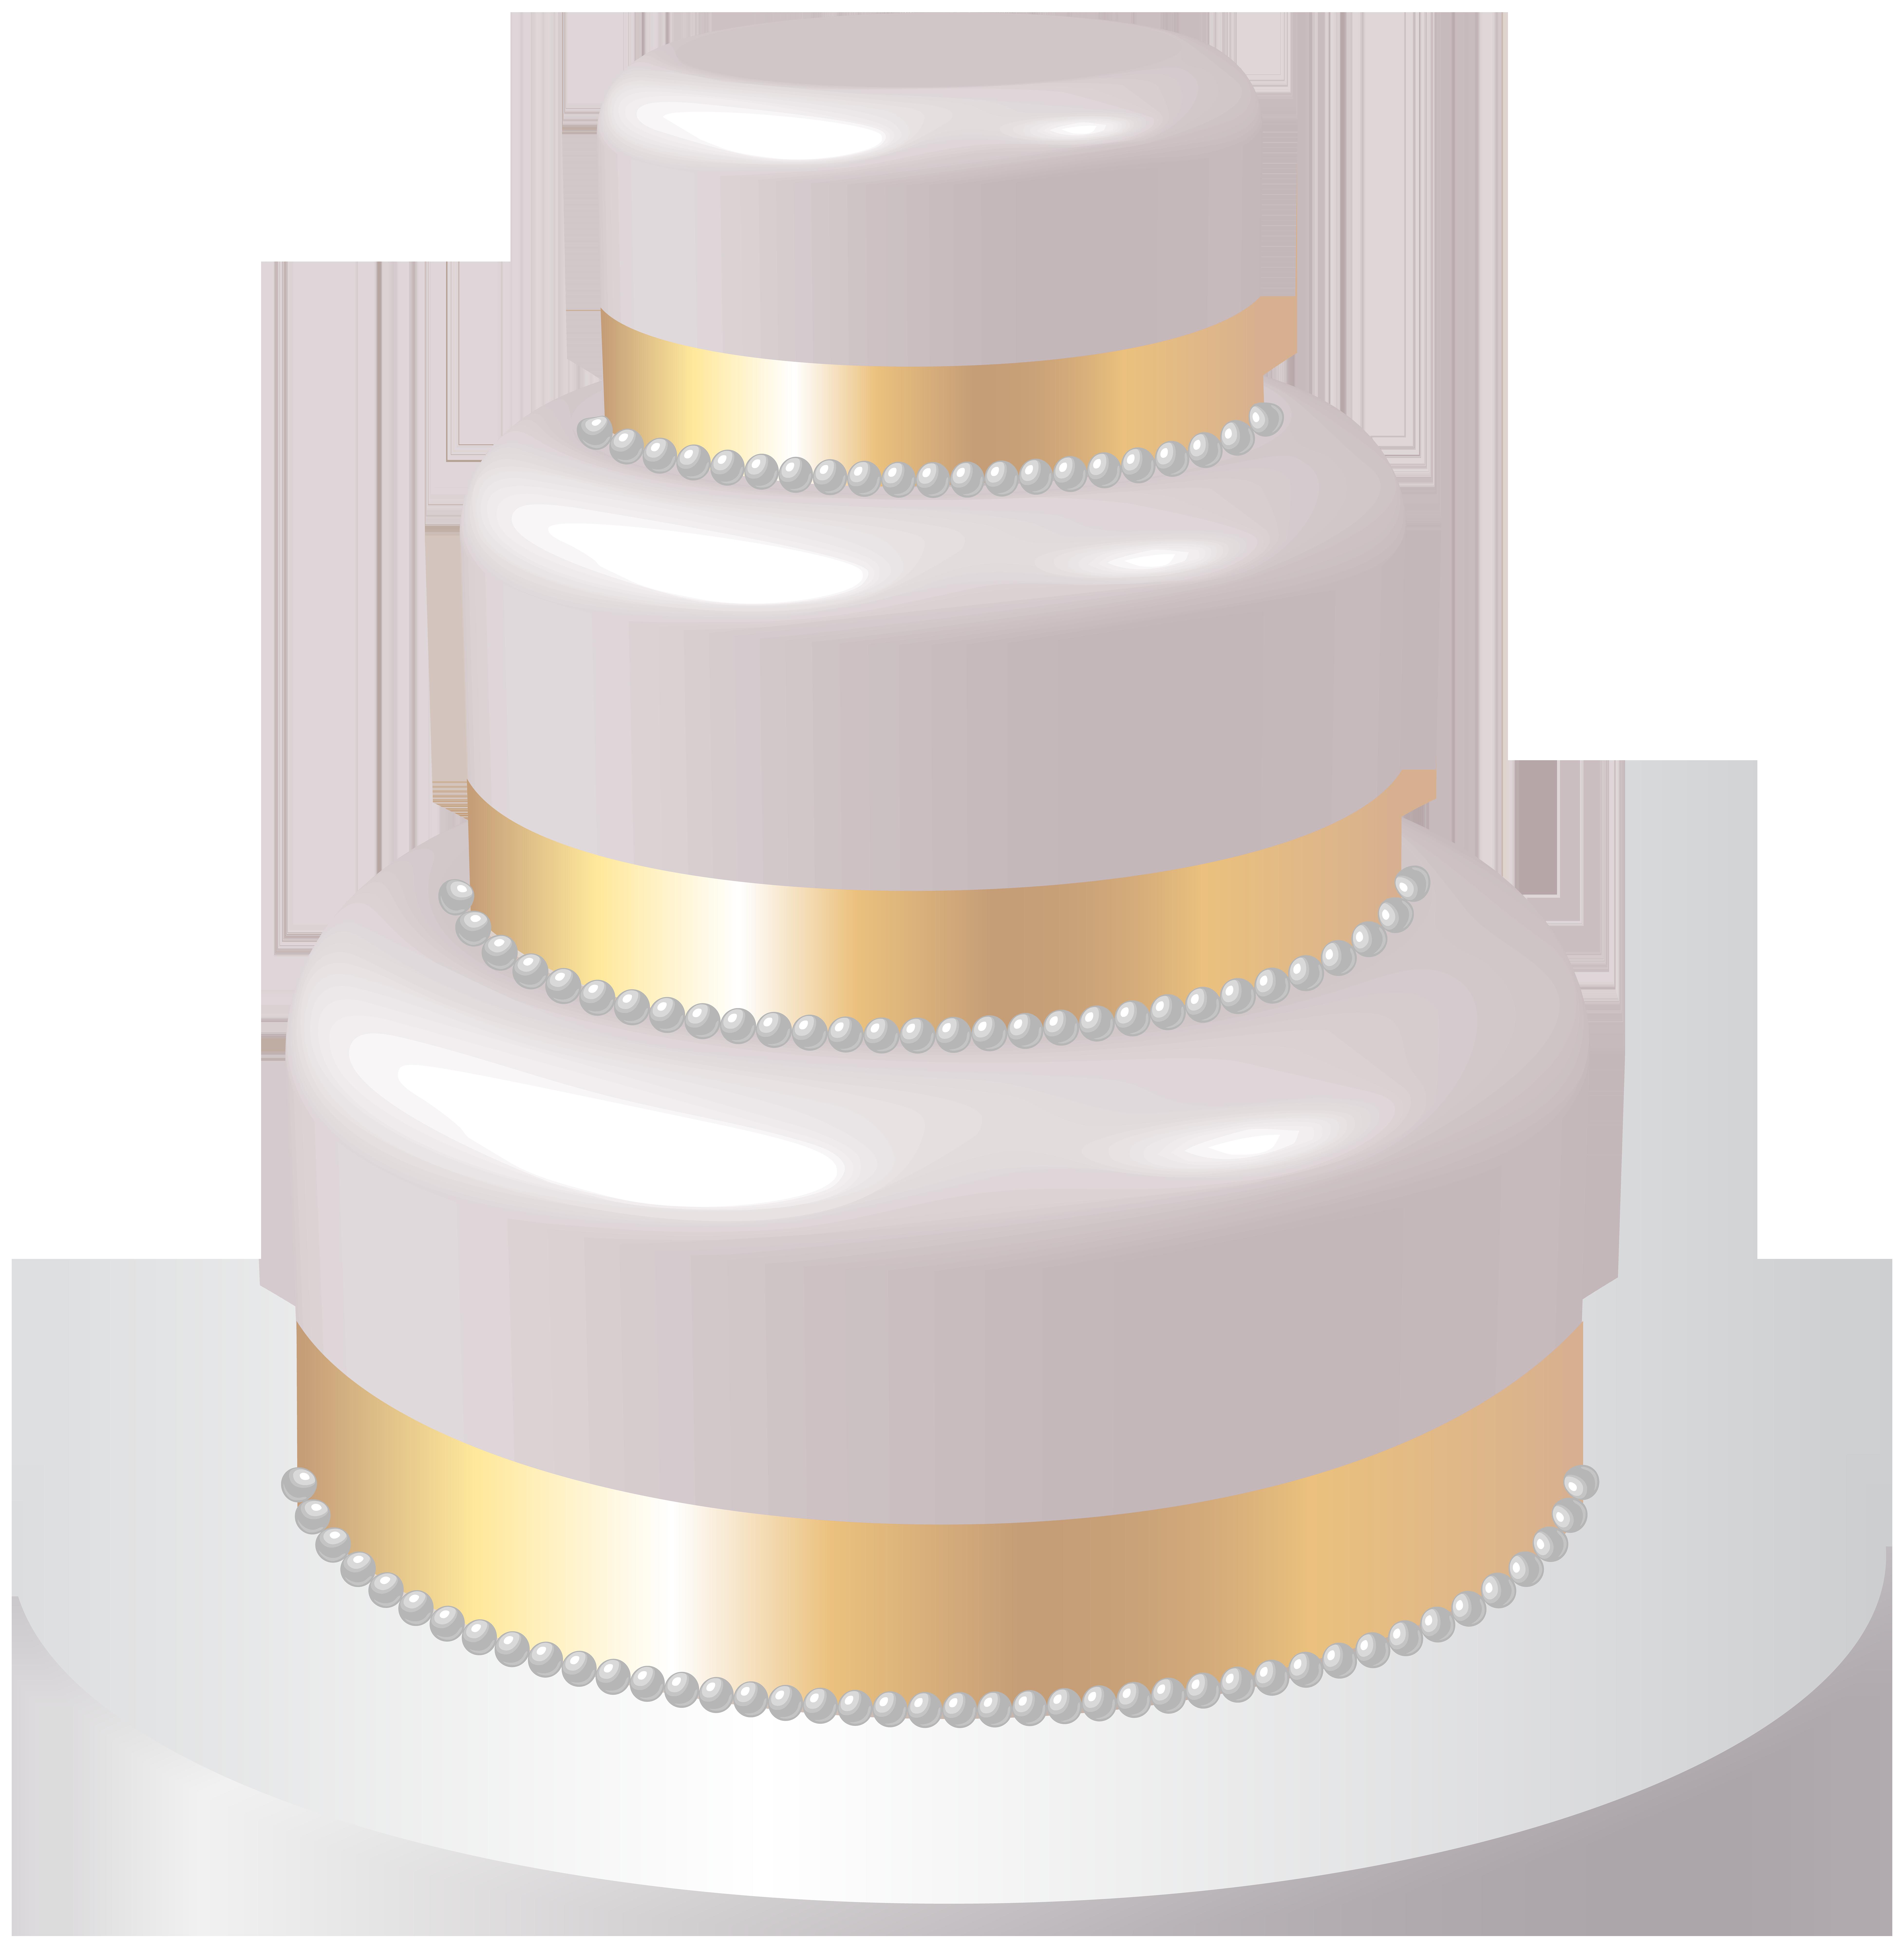 vector transparent Wedding cake clipart. Png clip art image